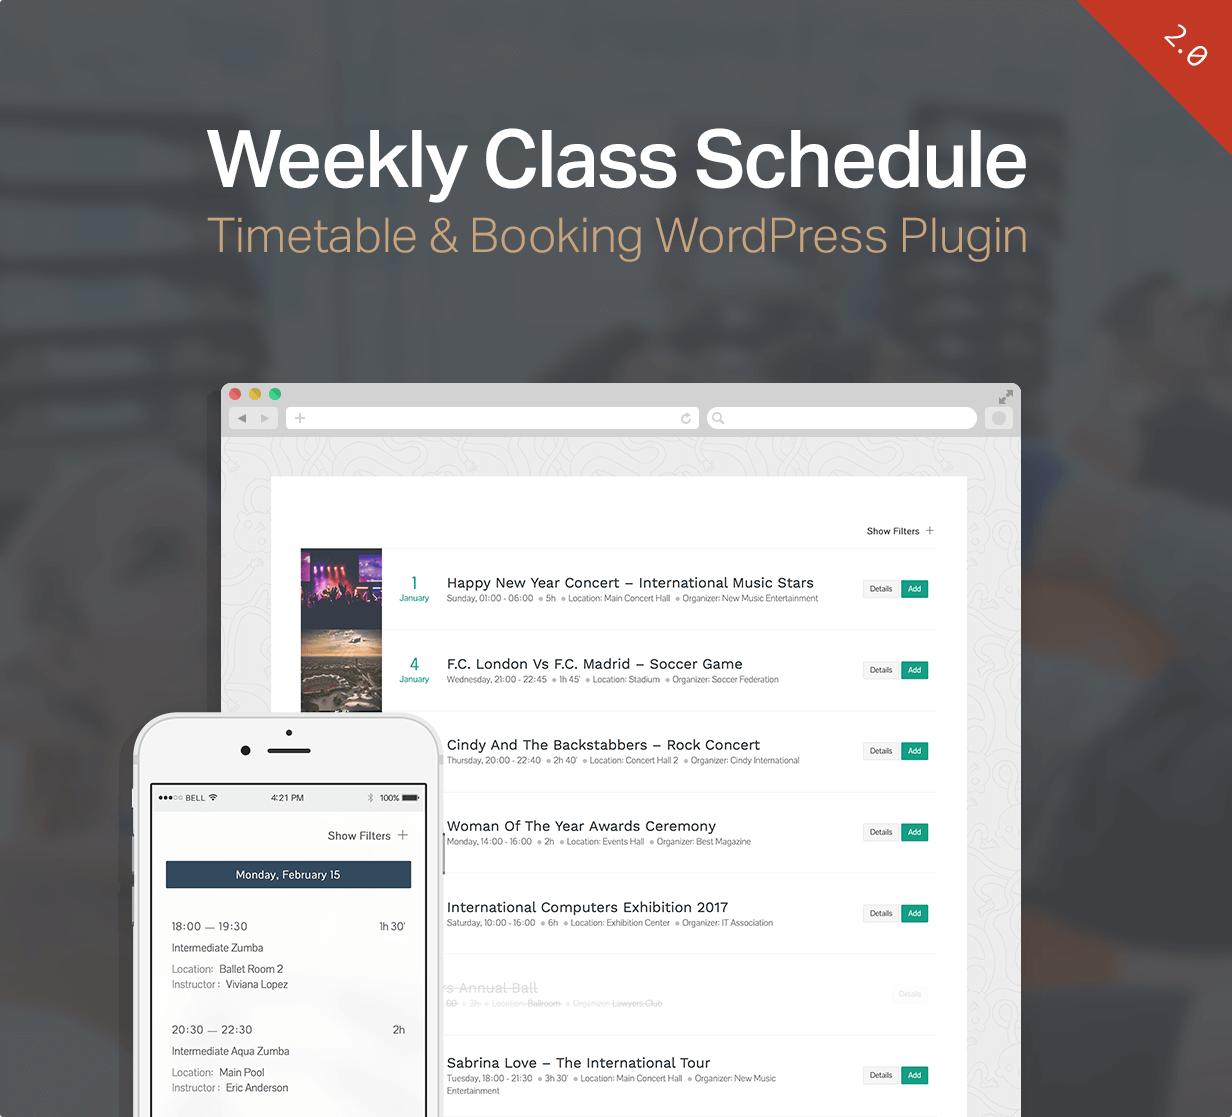 events6 - Events Schedule - WordPress Events Calendar Plugin